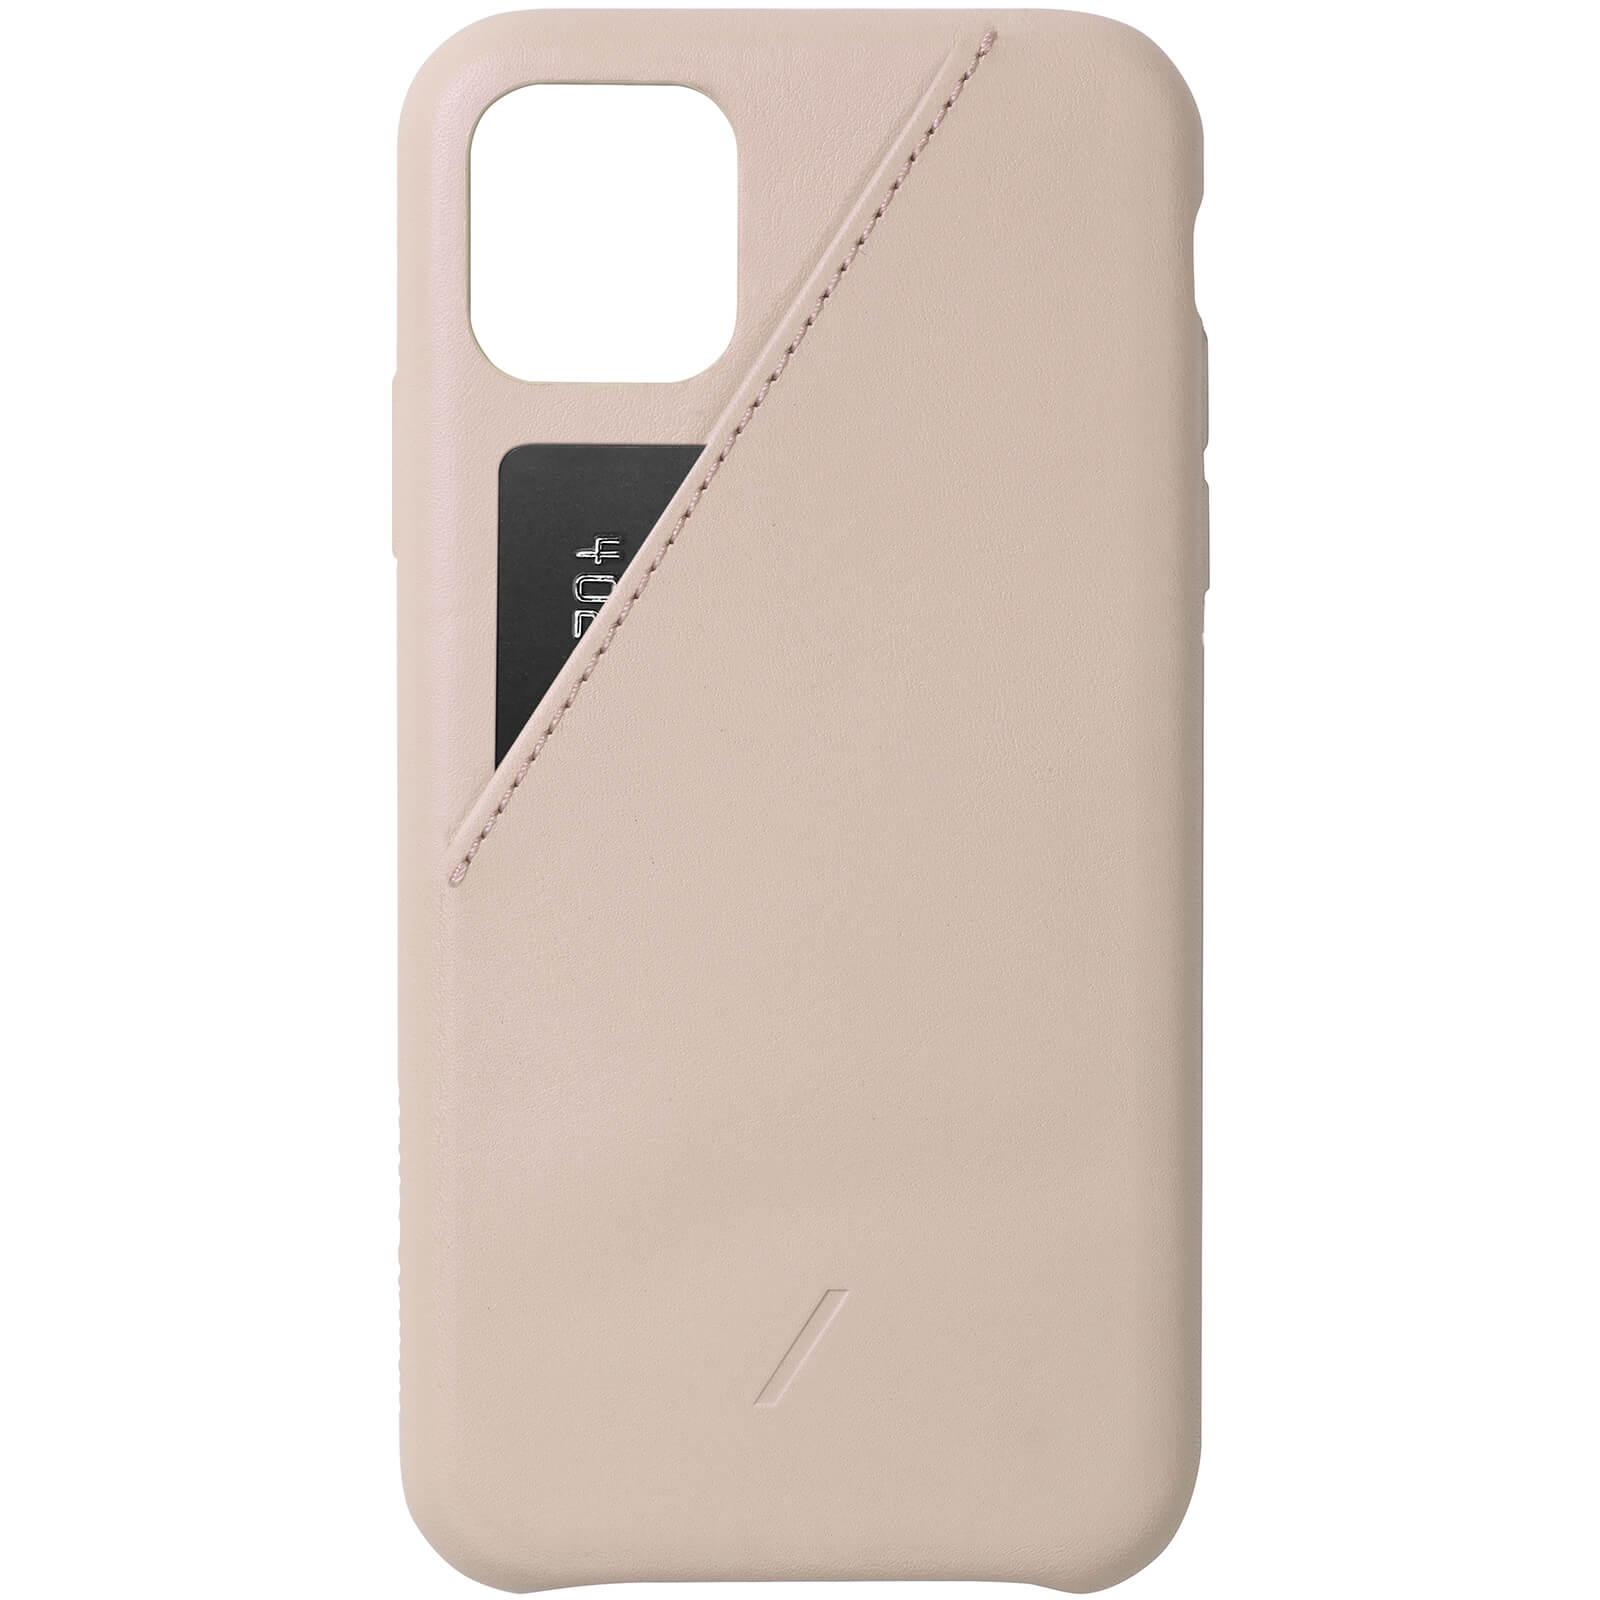 Native Union Clic Card iPhone Case - Nude - iPhone 11